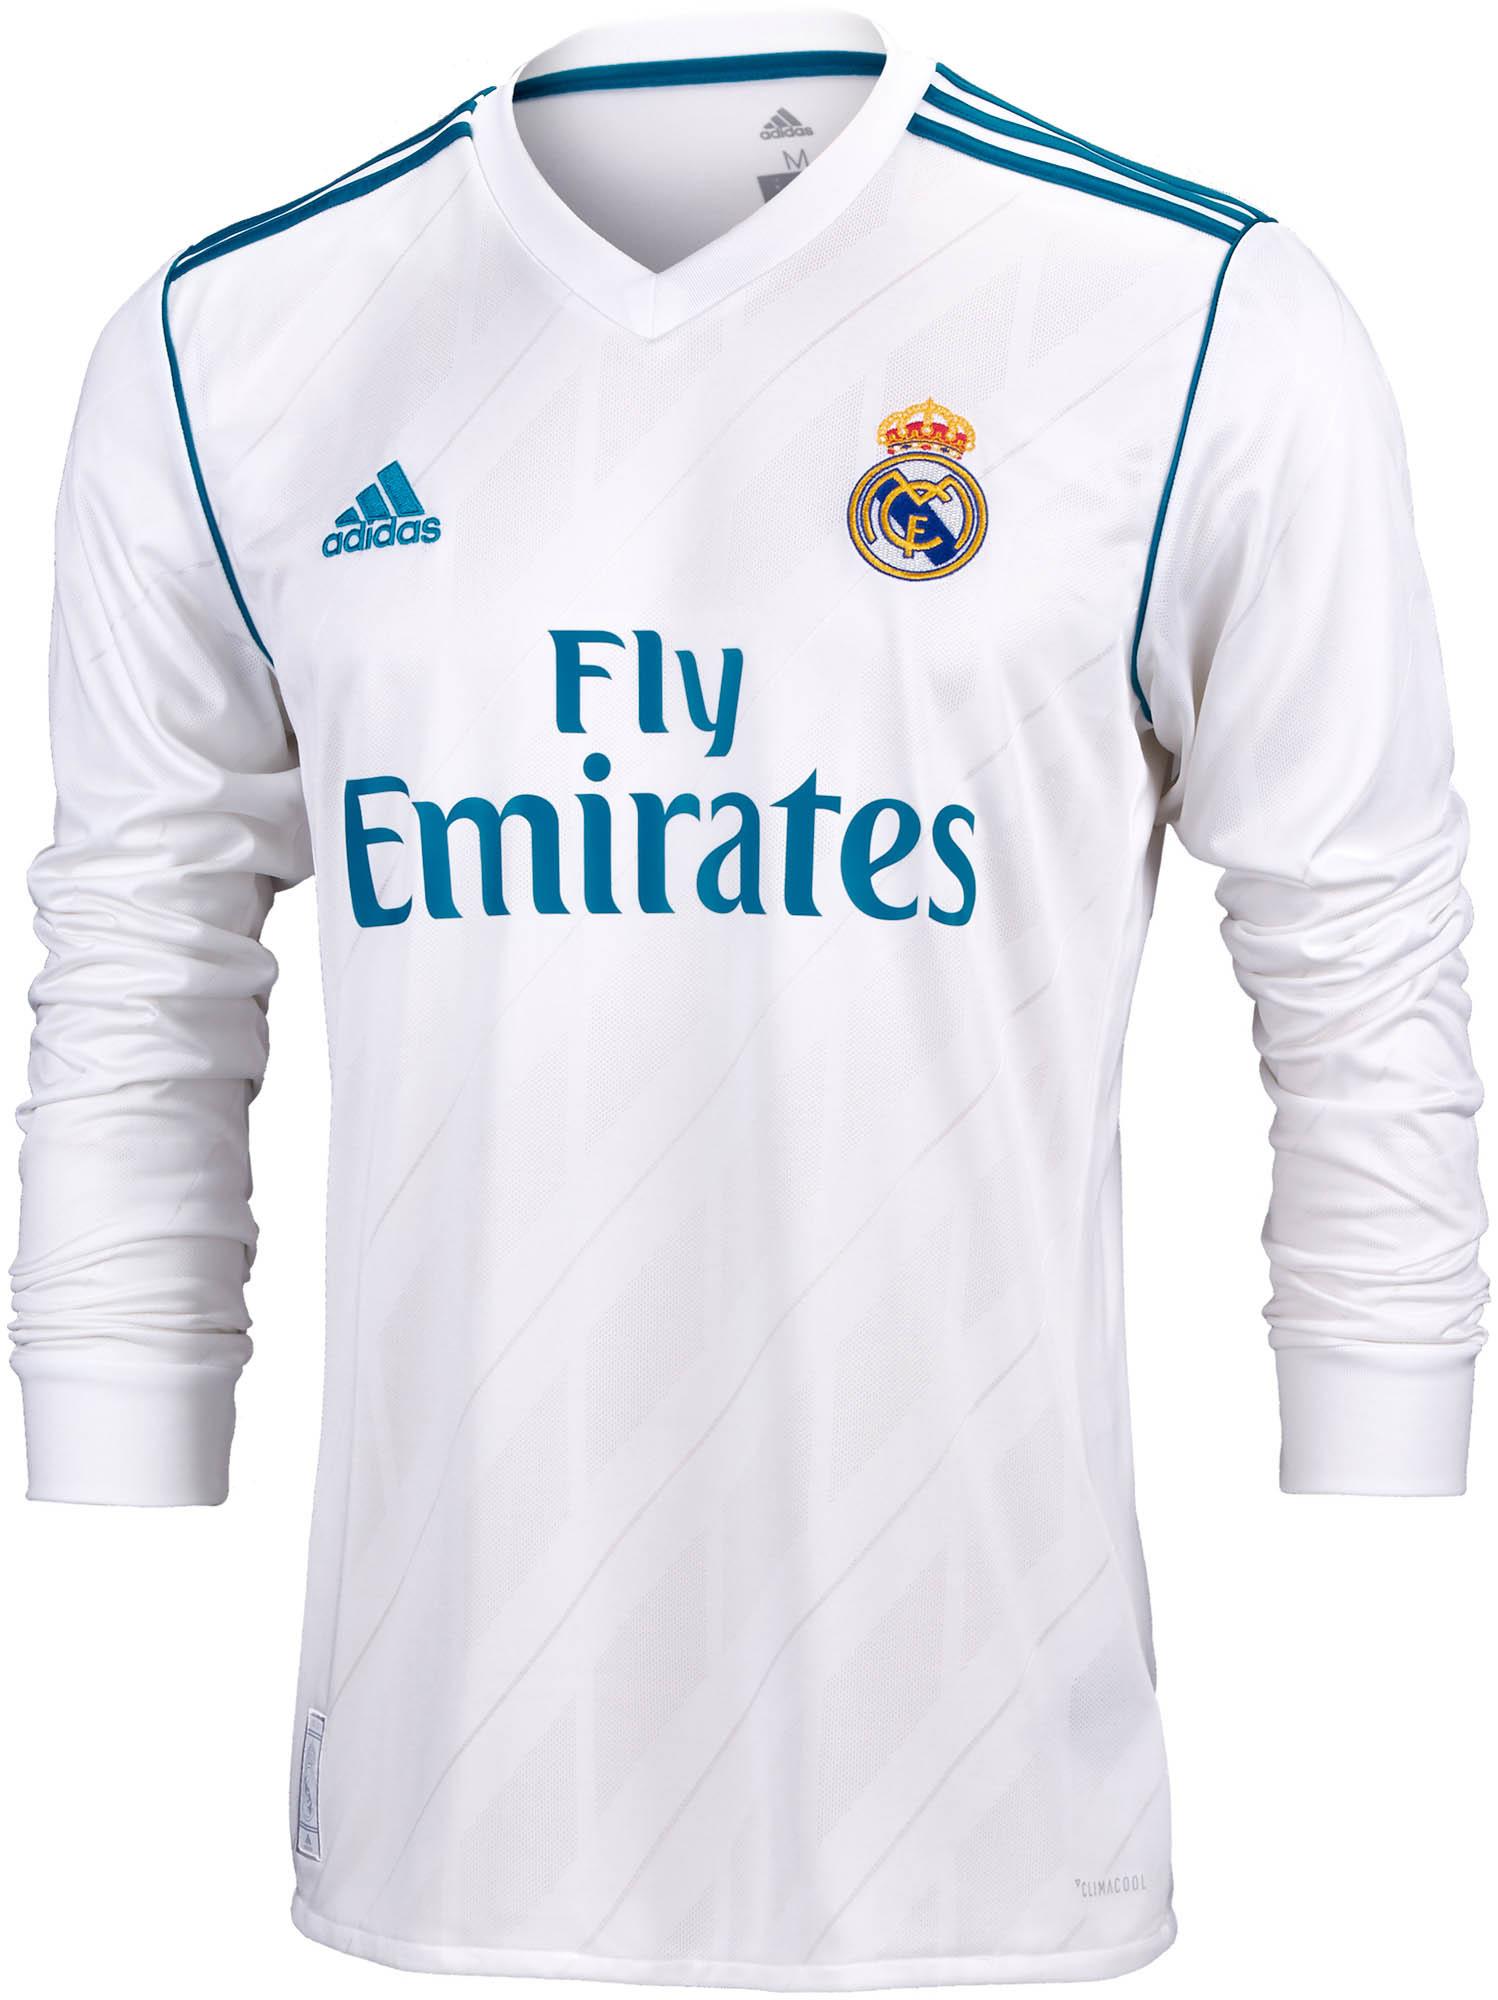 2017/18 adidas Real Madrid L/S Home Jerseys